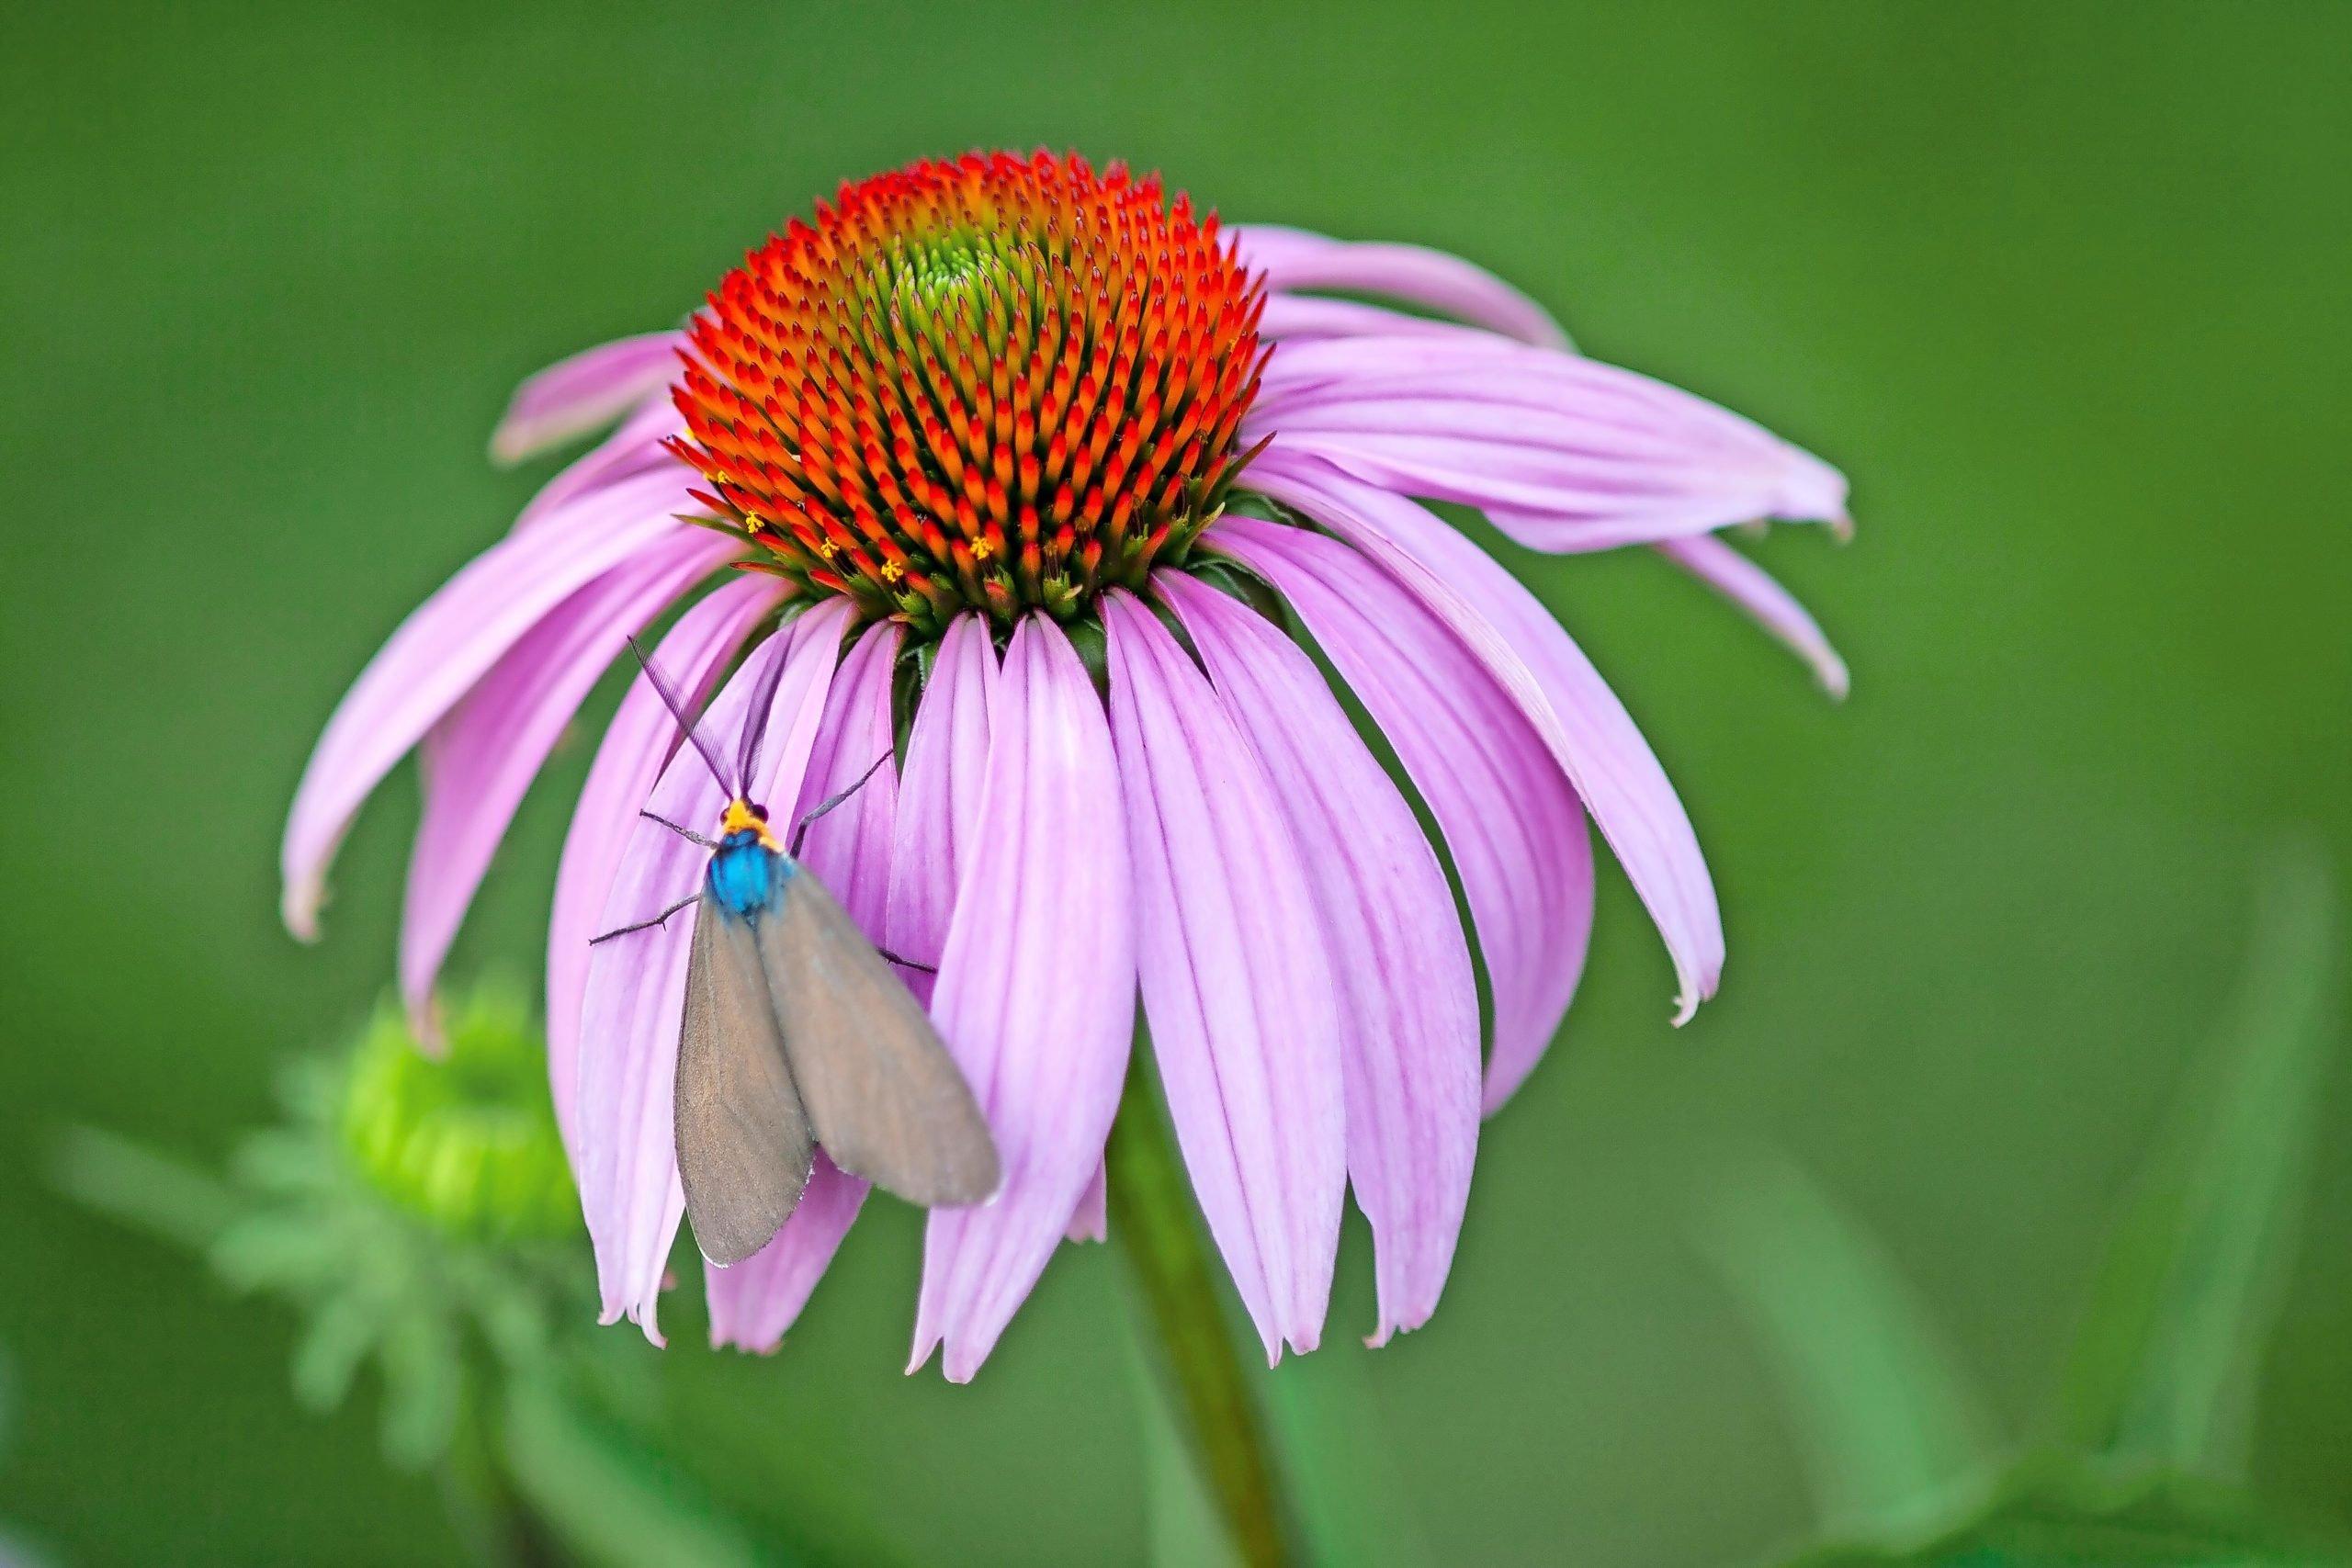 A Virginia ctenucha moth on a coneflower.